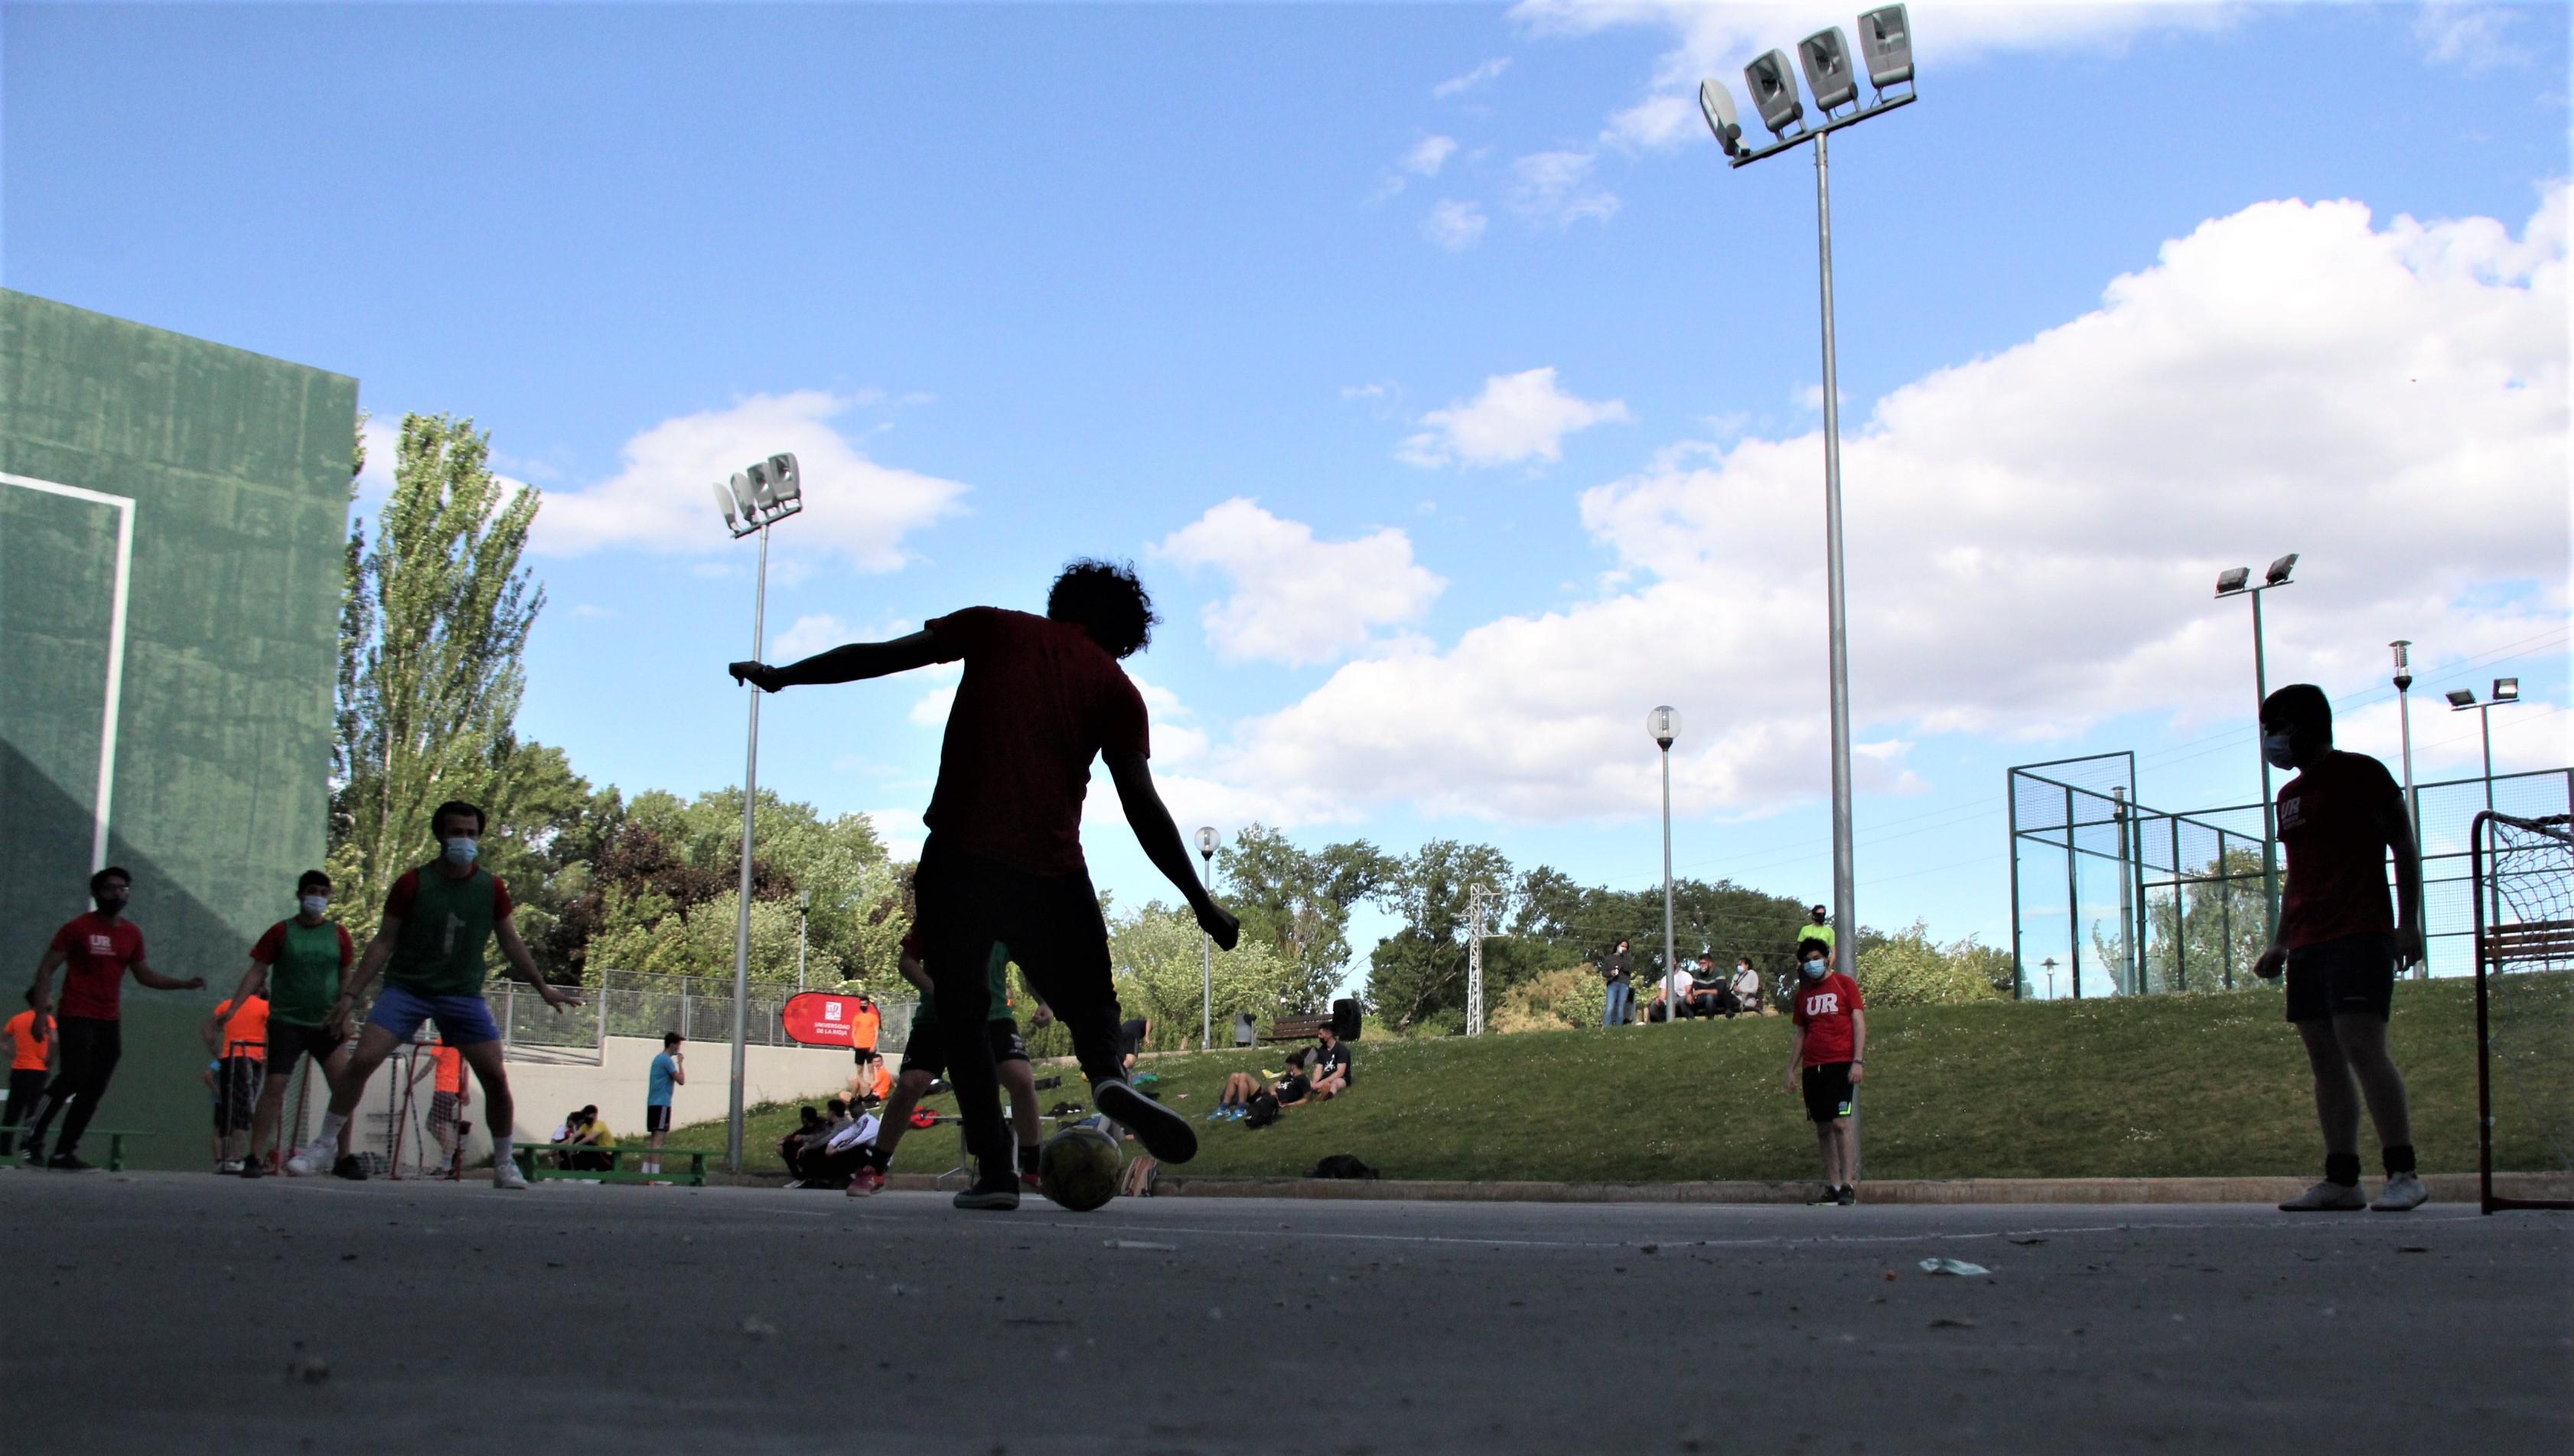 18 -20 mayo | Torneo de Street Football 3x3